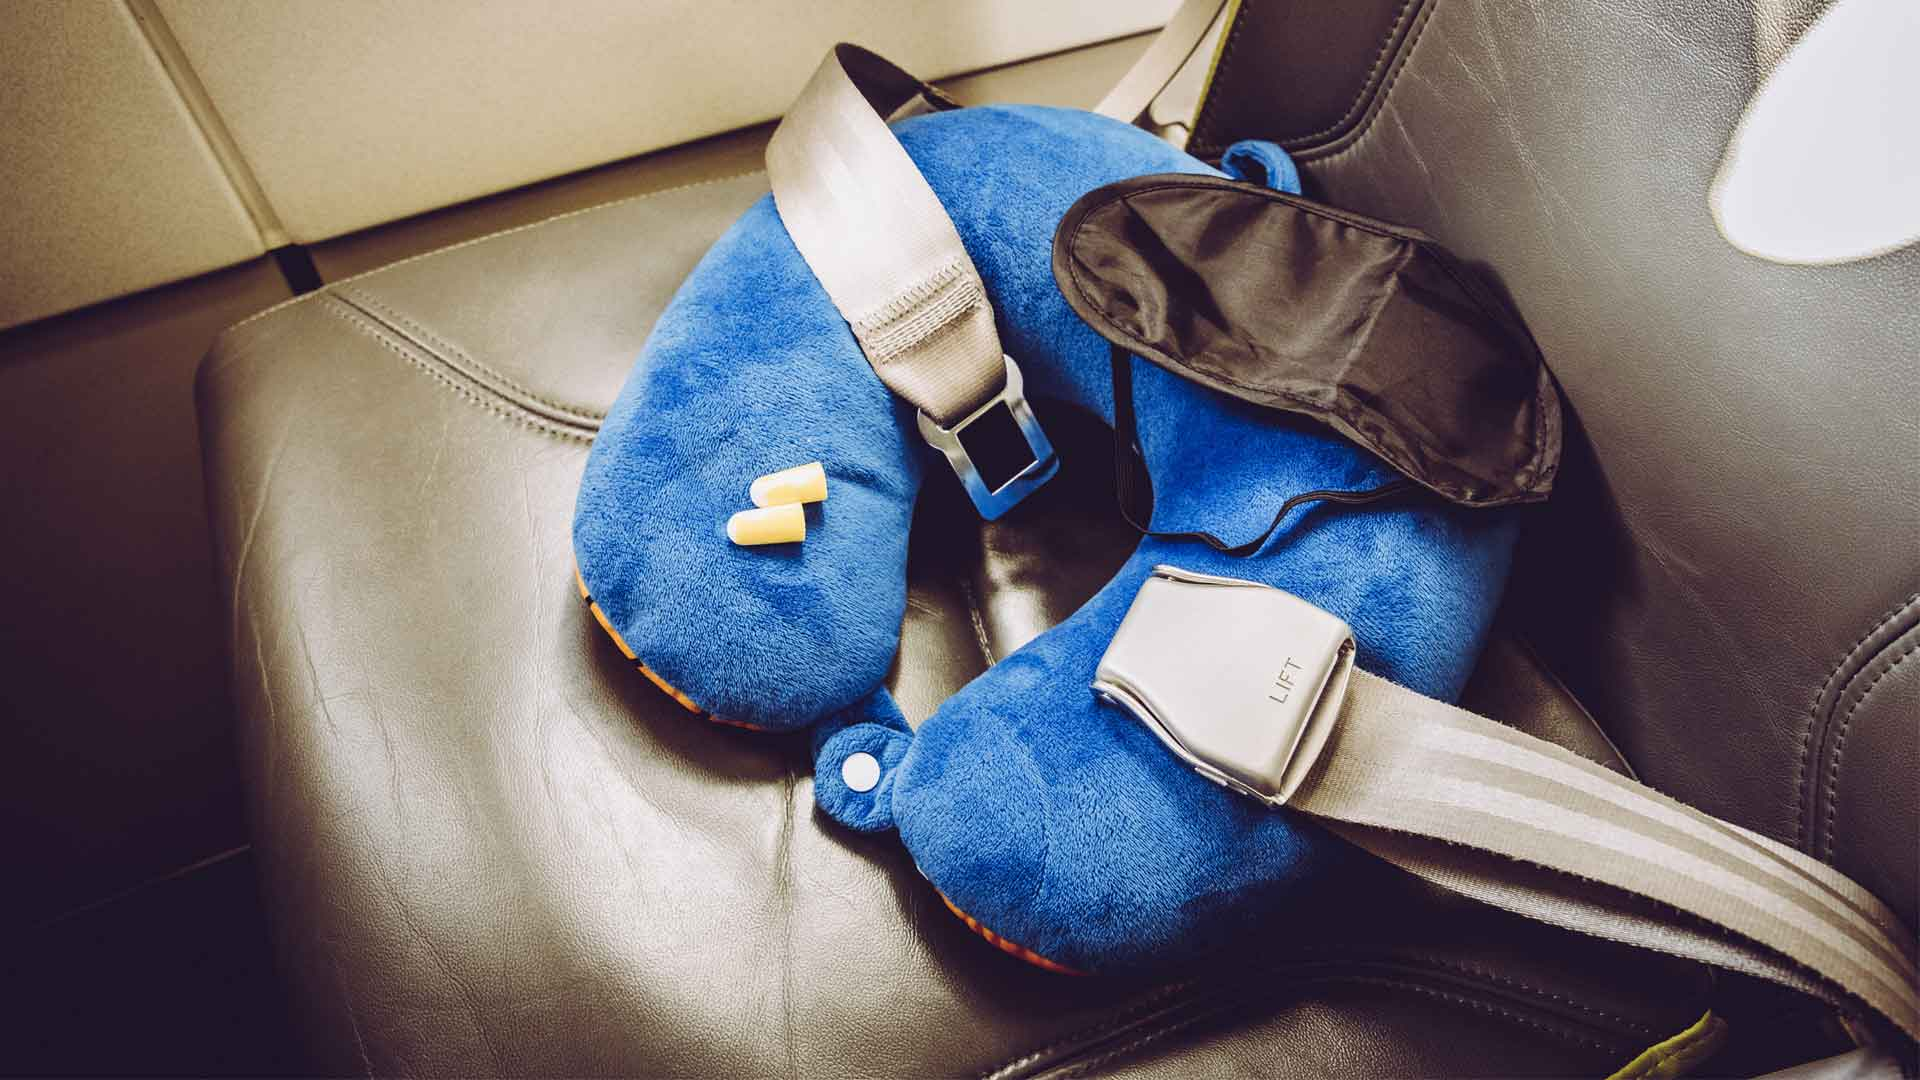 5 almohadas para descansar al momento de viajar